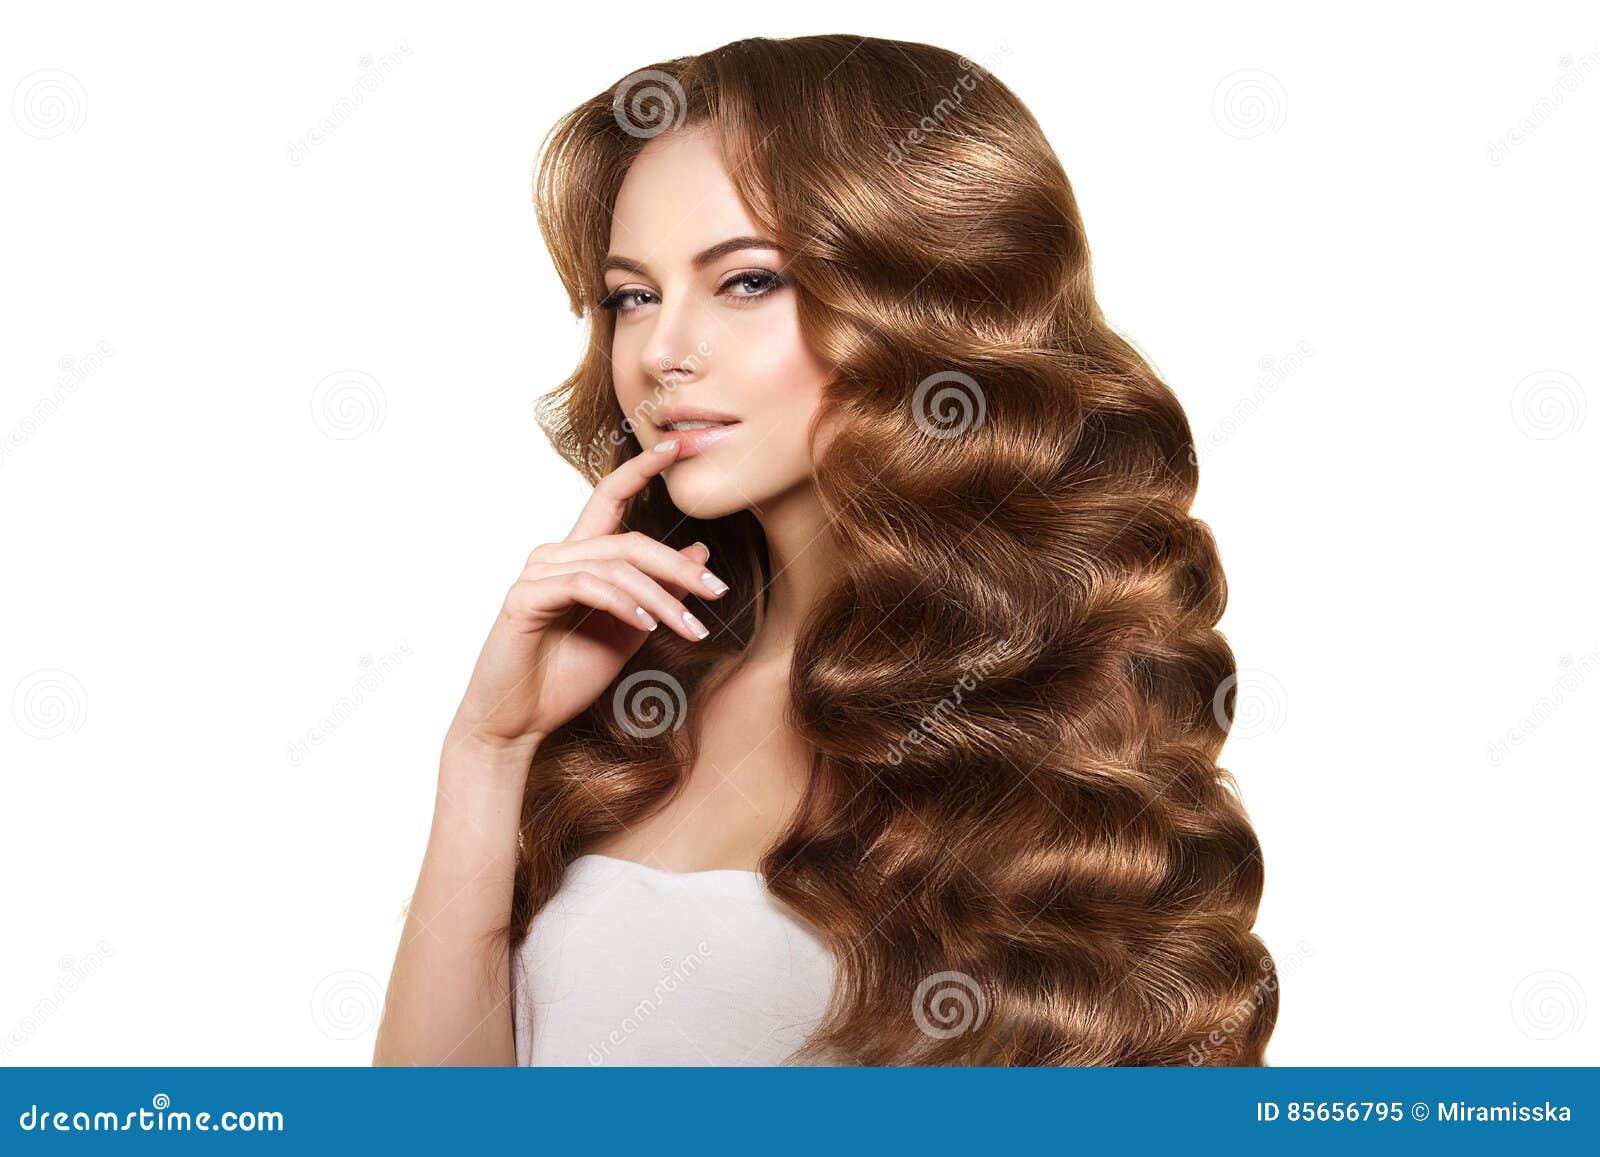 Langes Haar Wellen Locken Frisur Schonheits Frau Mit Dem Langen